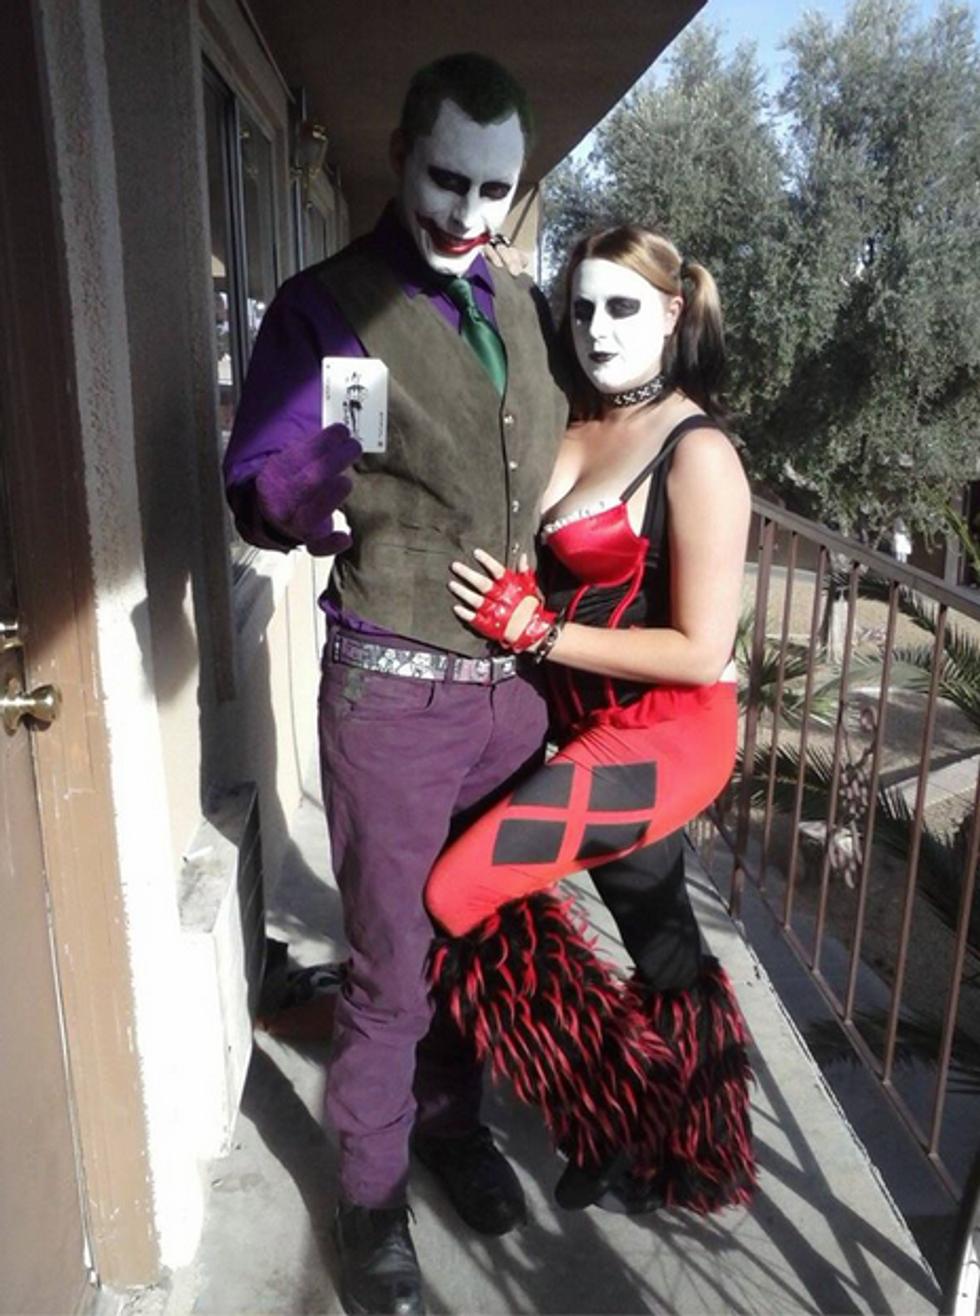 Jerad Amanda Miller Joker cosplay